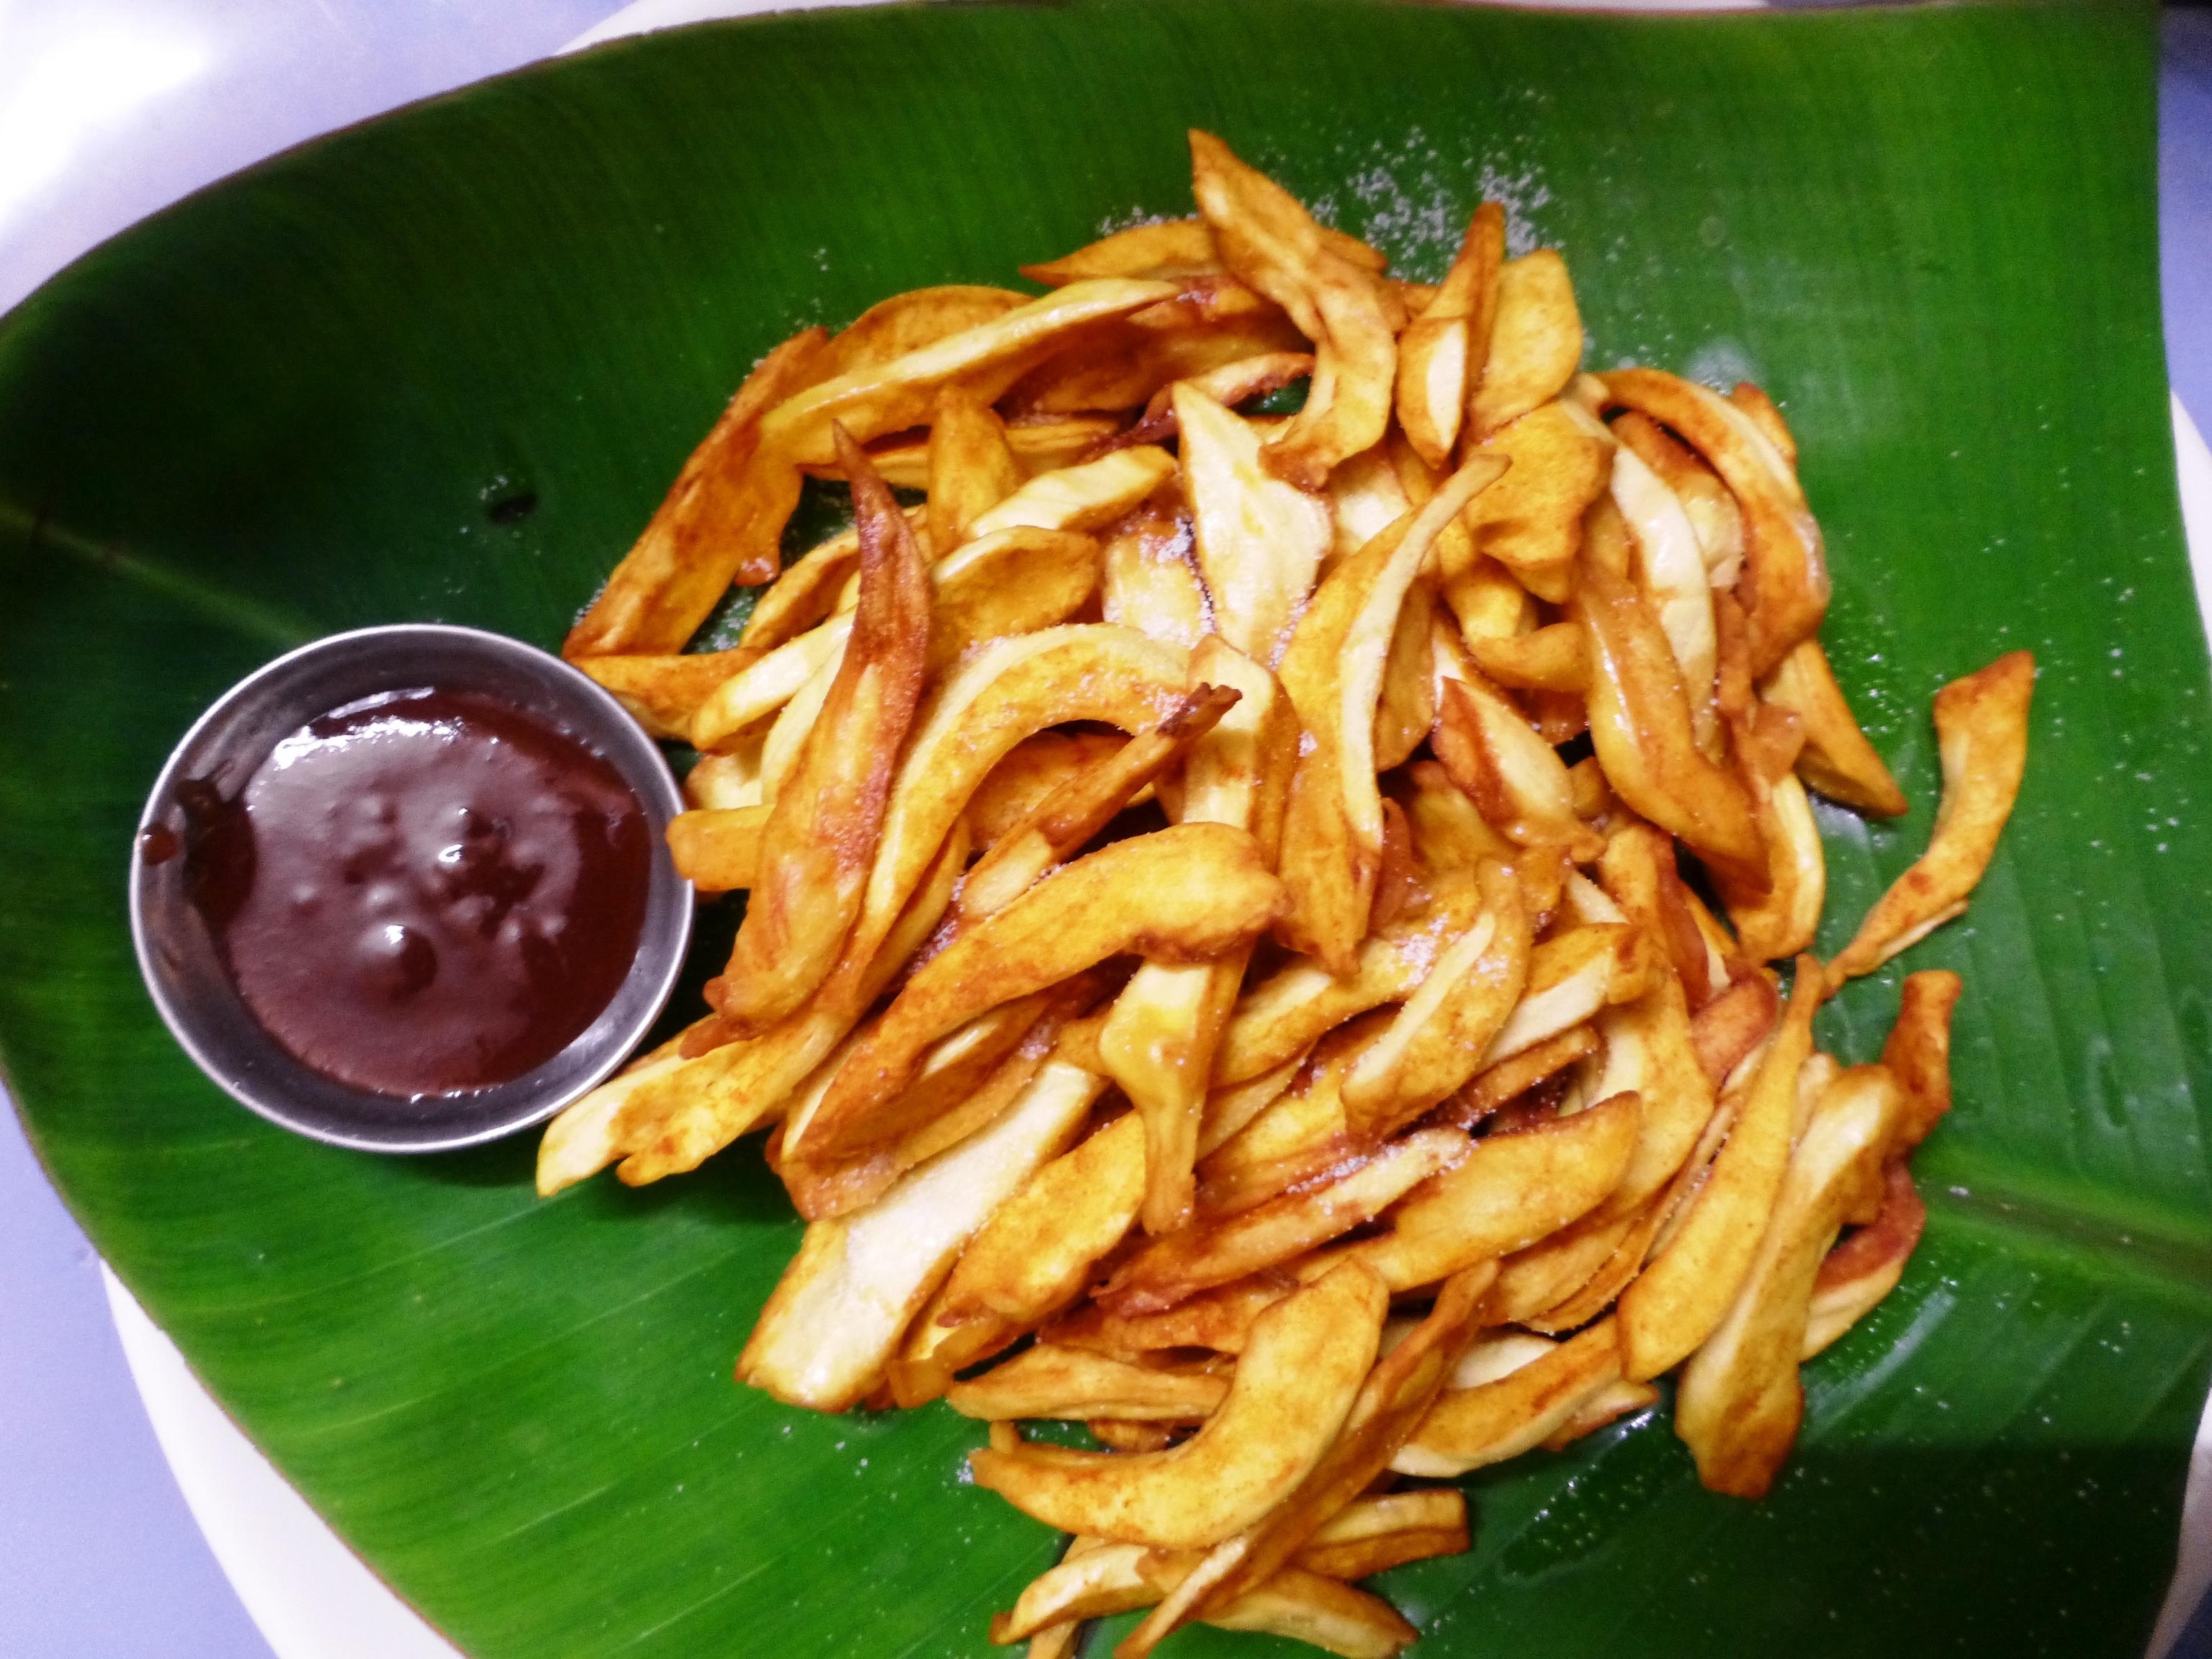 Tasty And Crispy Jackfruit Chips